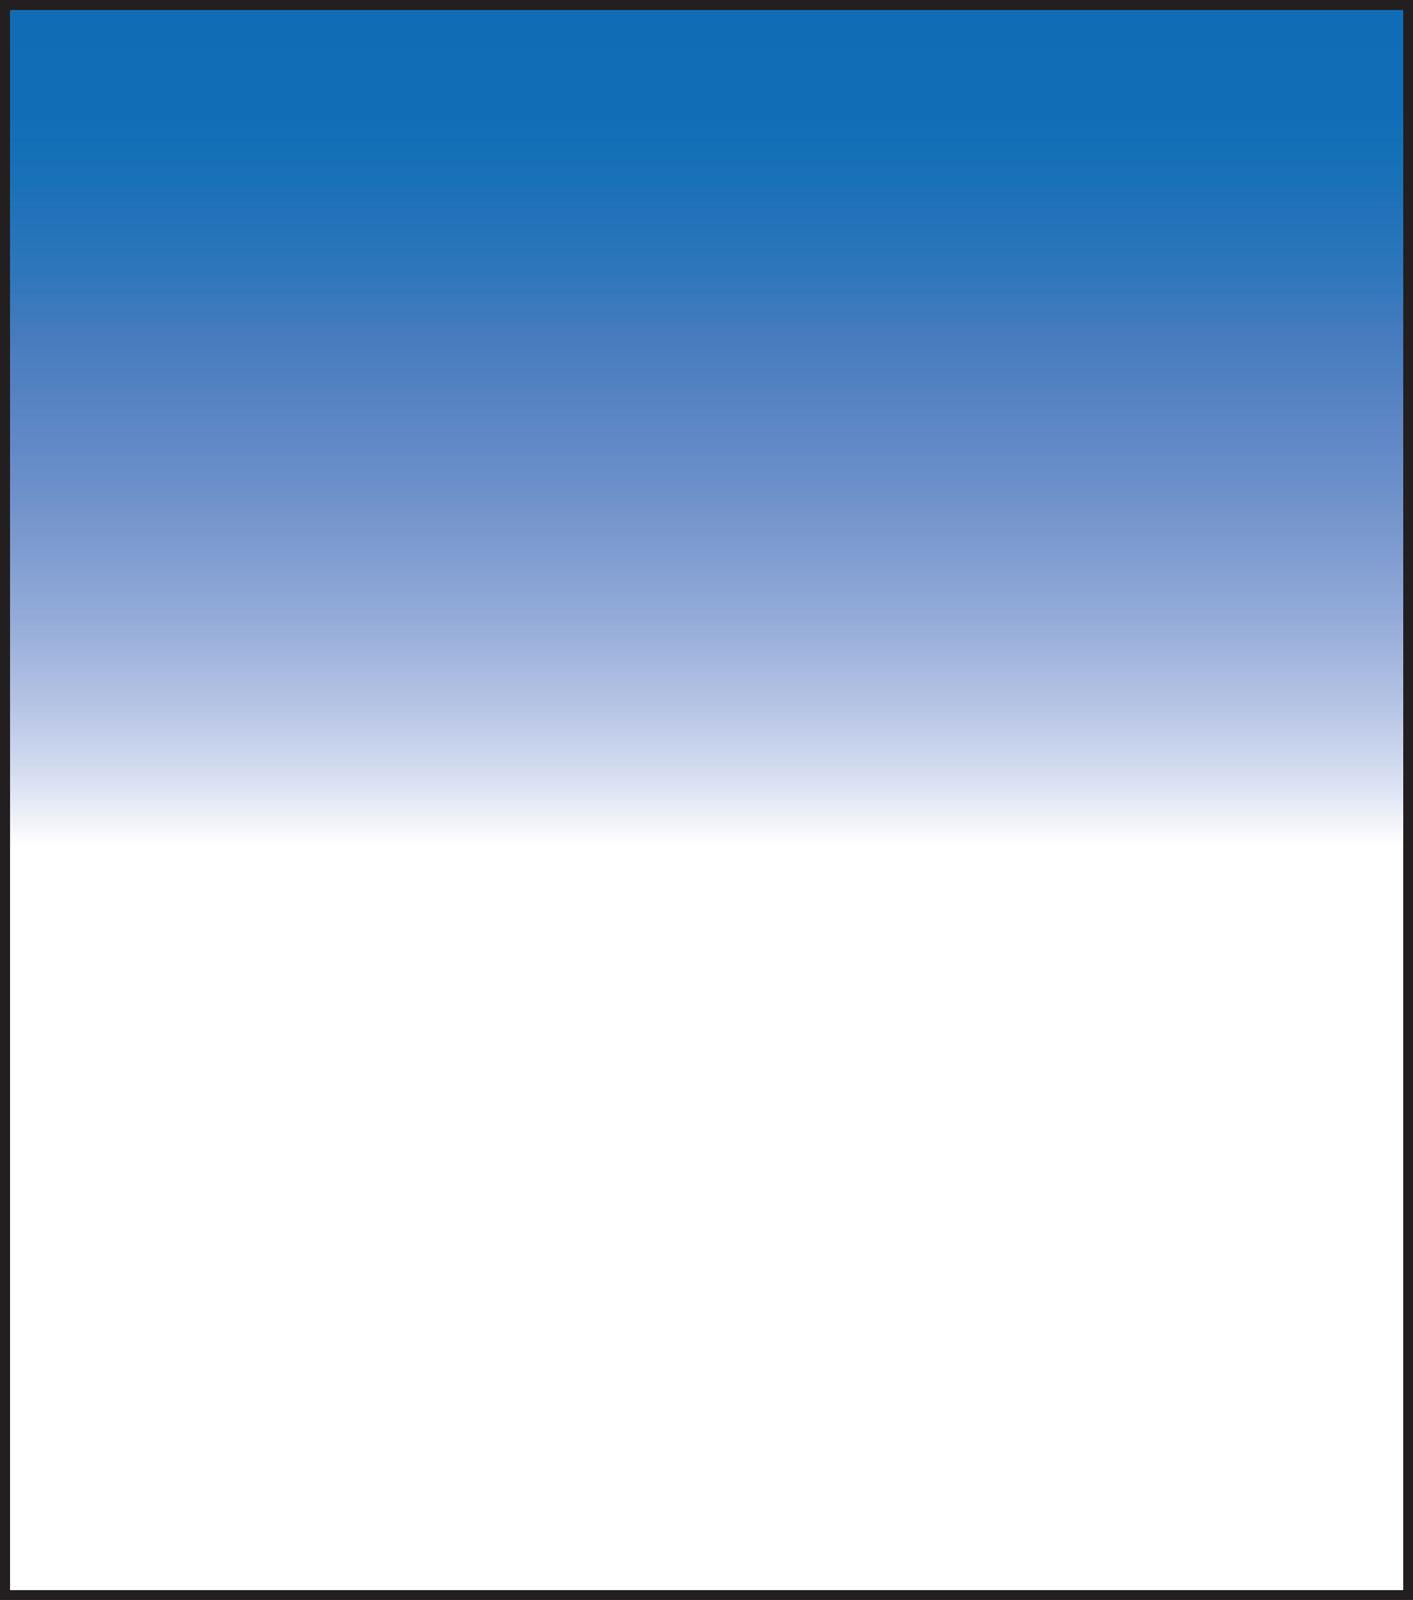 SW150-Sky-Blue-5-Hard-Grad